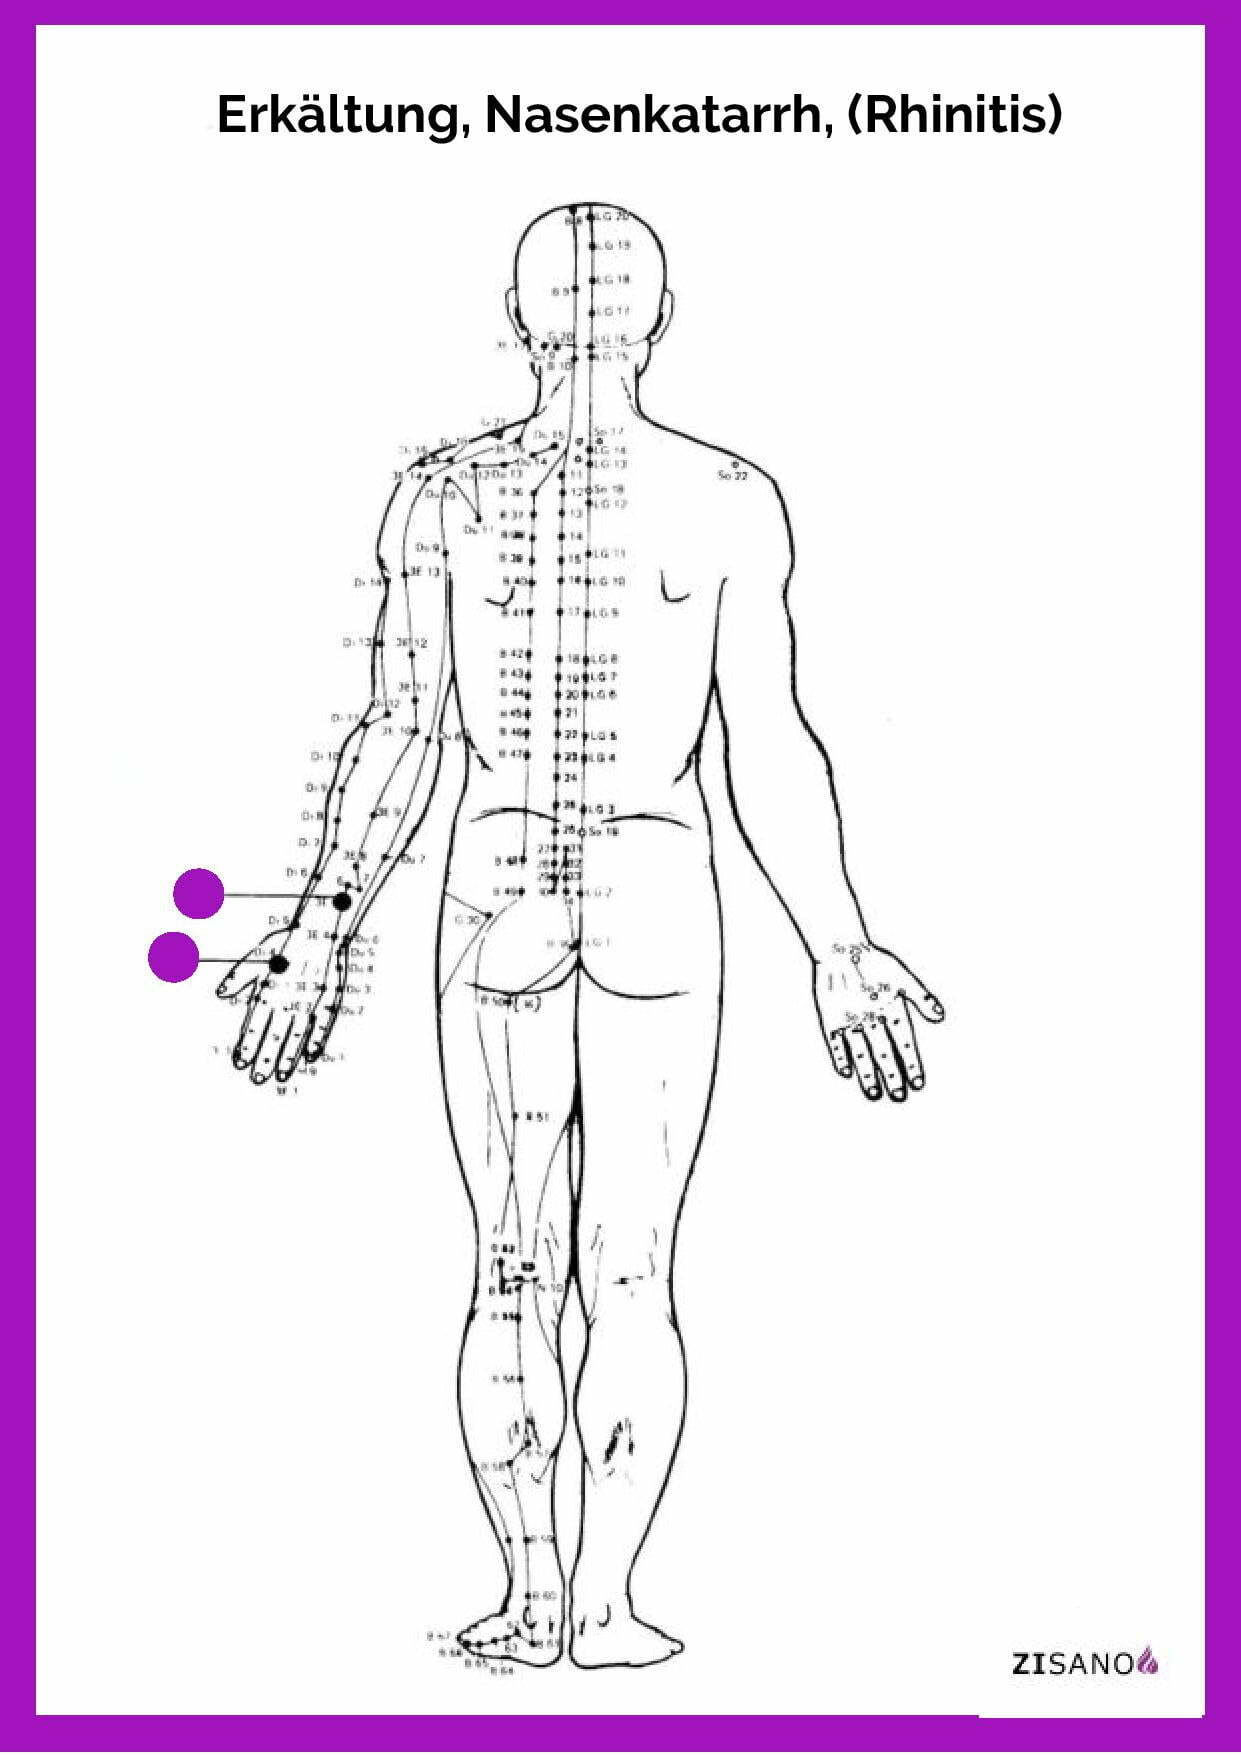 Meridiane - Erkältung (Rhinitis)- Behandlung